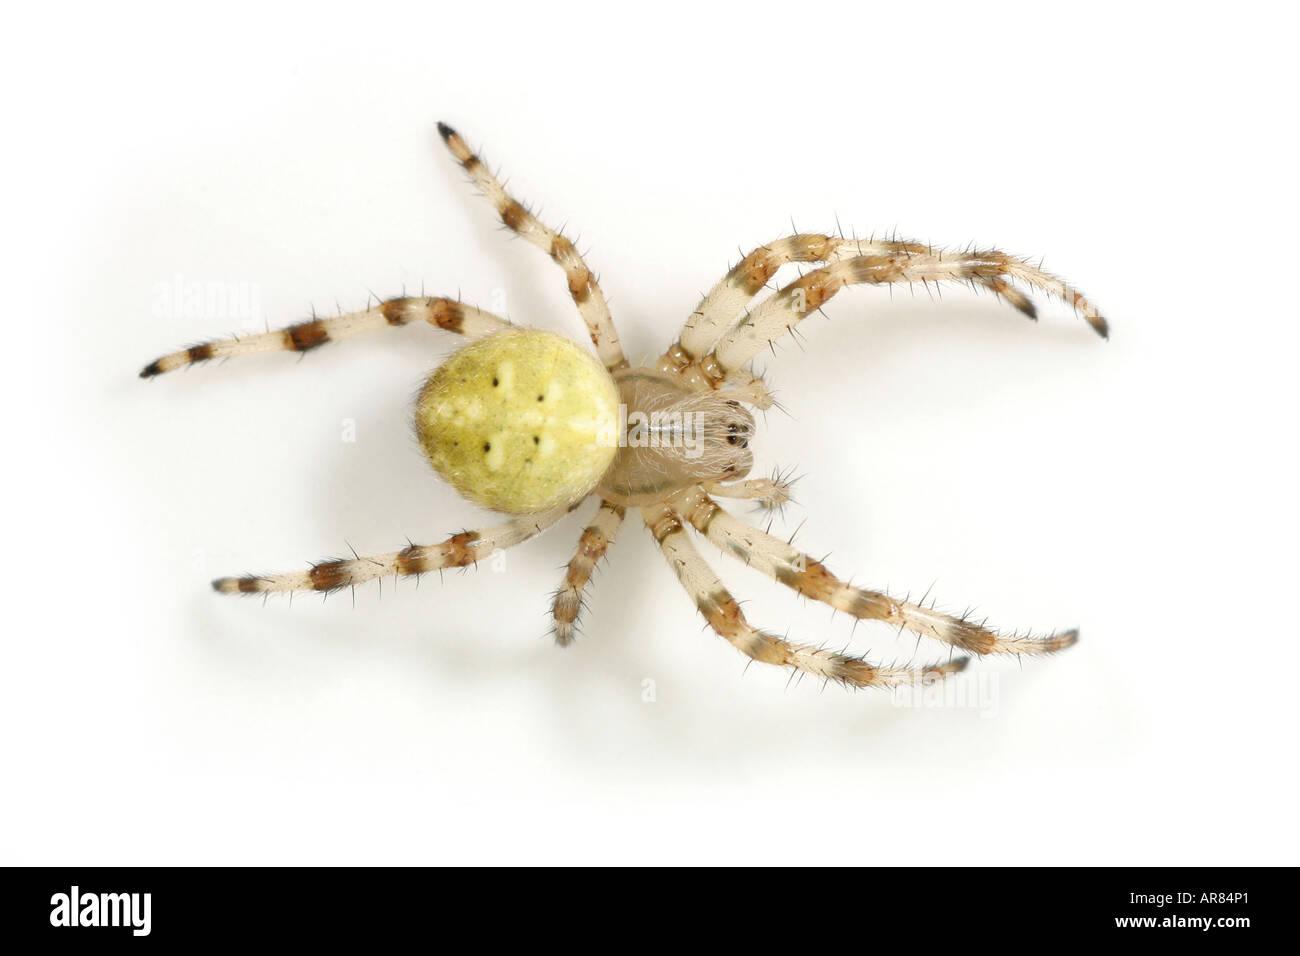 Araneus Quadratus spider on white background Stock Photo